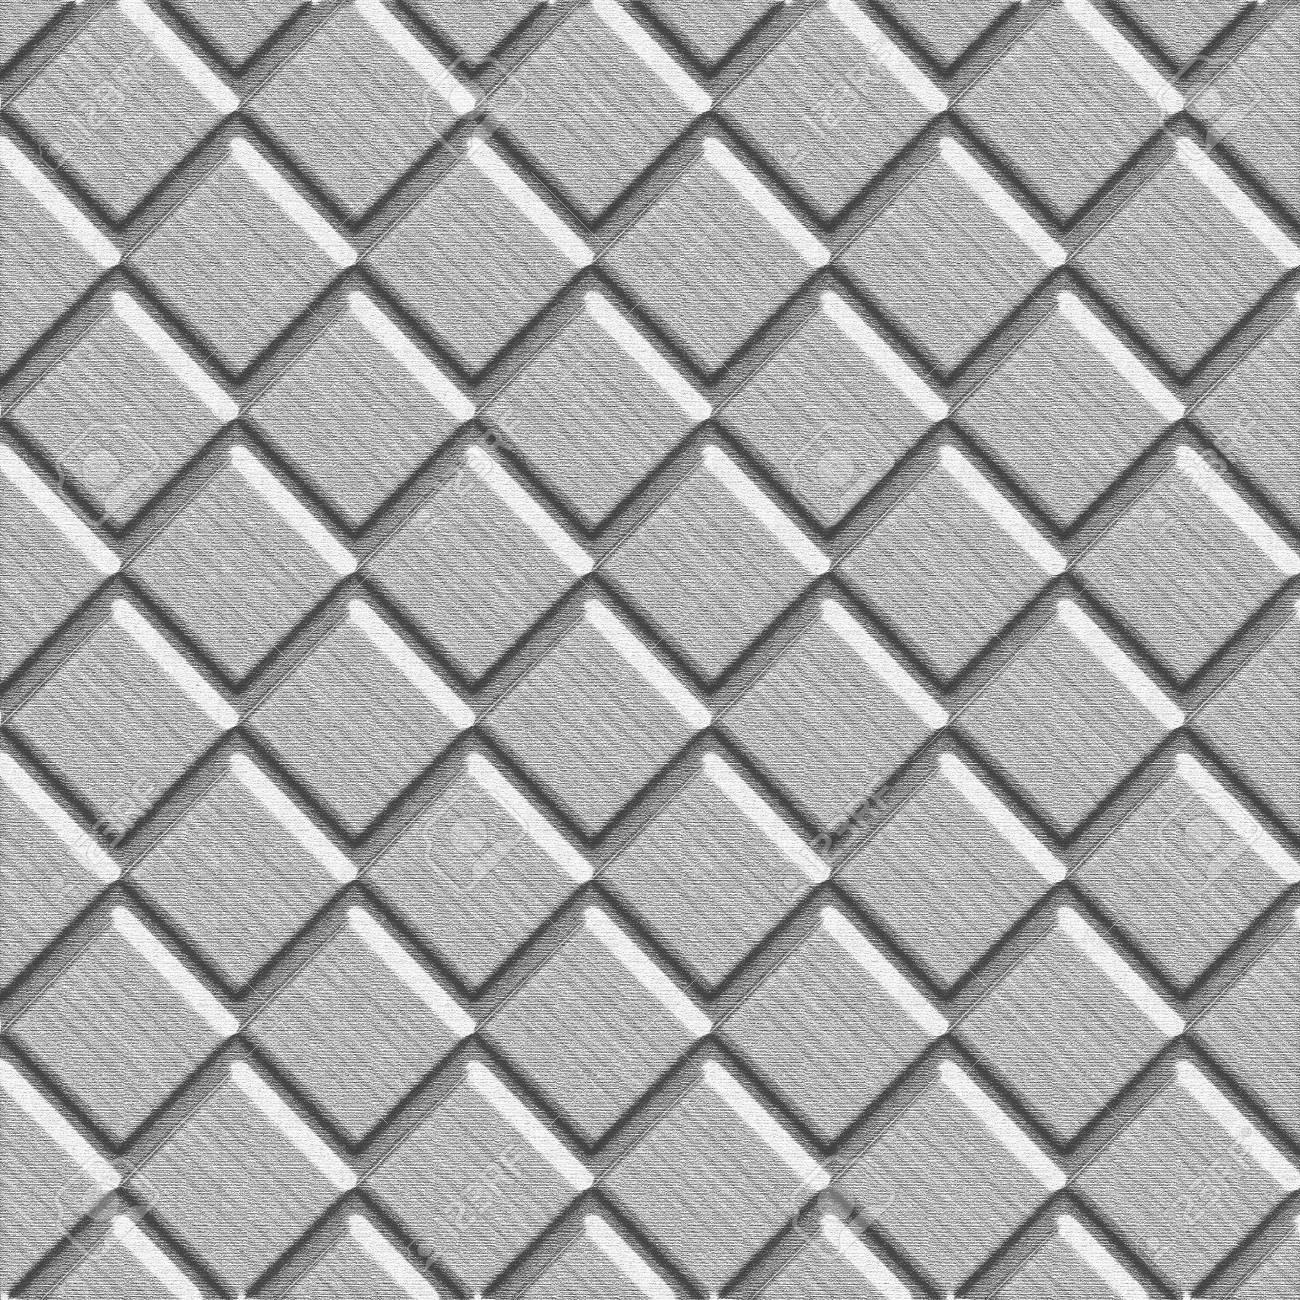 Simple Gray Geometric Wallpaper Background